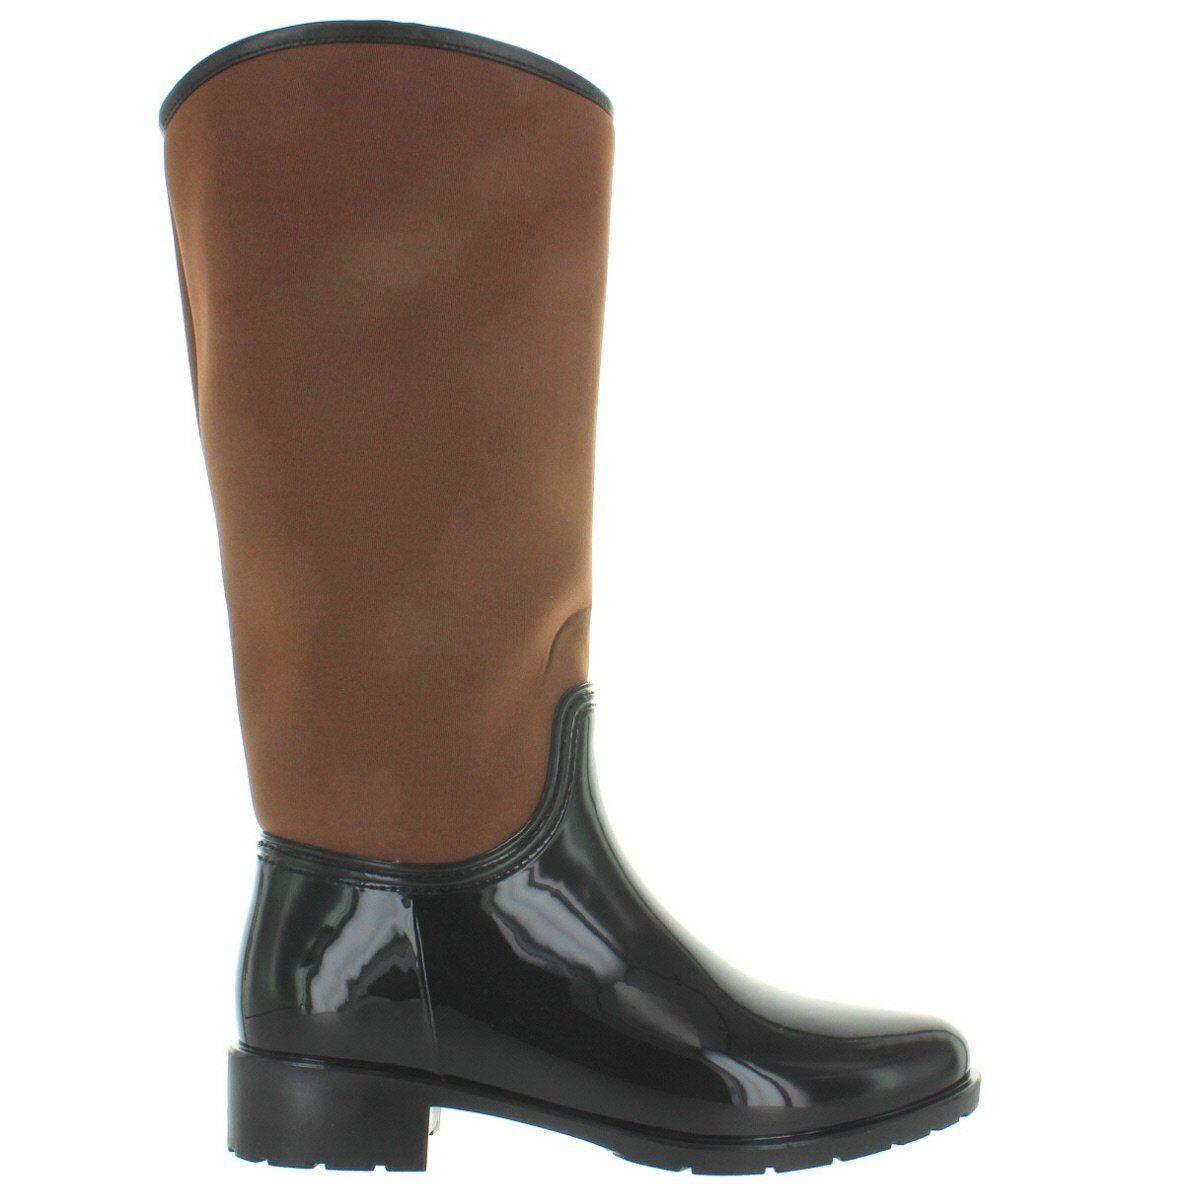 Kixters Cougar - Dark Brown Shiny Rubber Caramel Nylon Tall Rain Boot